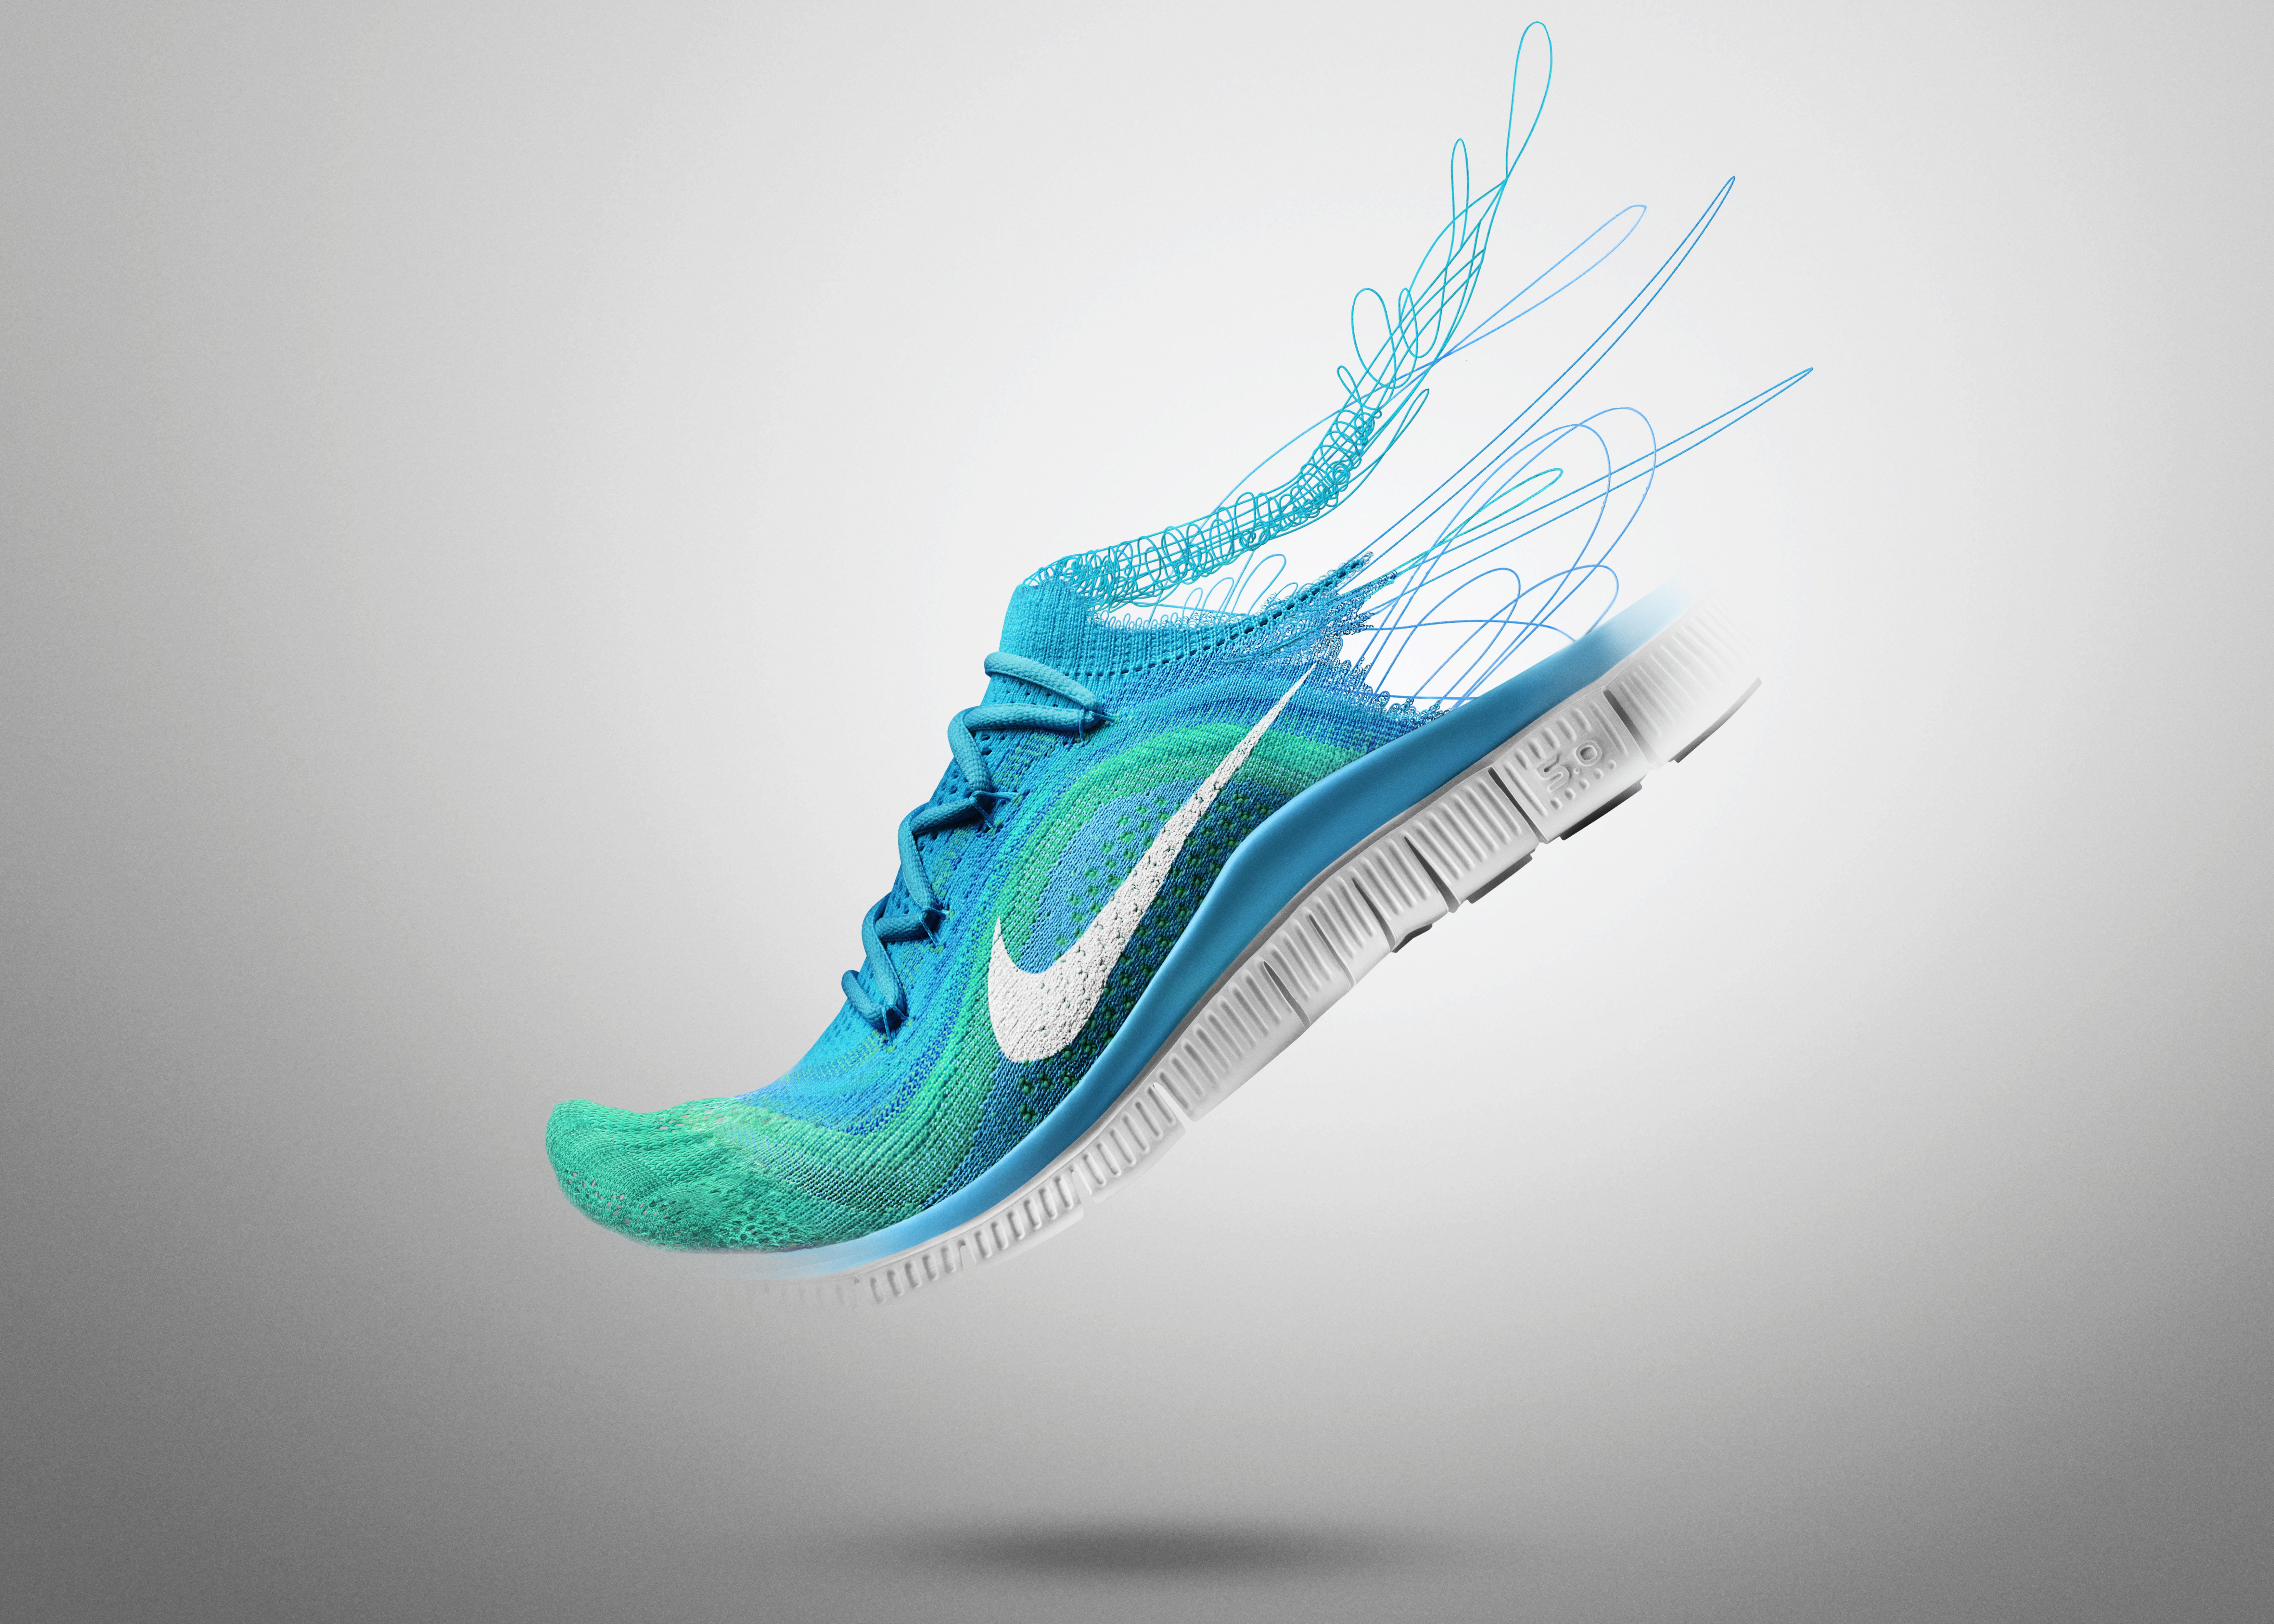 best nike flyknit shoes nike free trainer 5.0